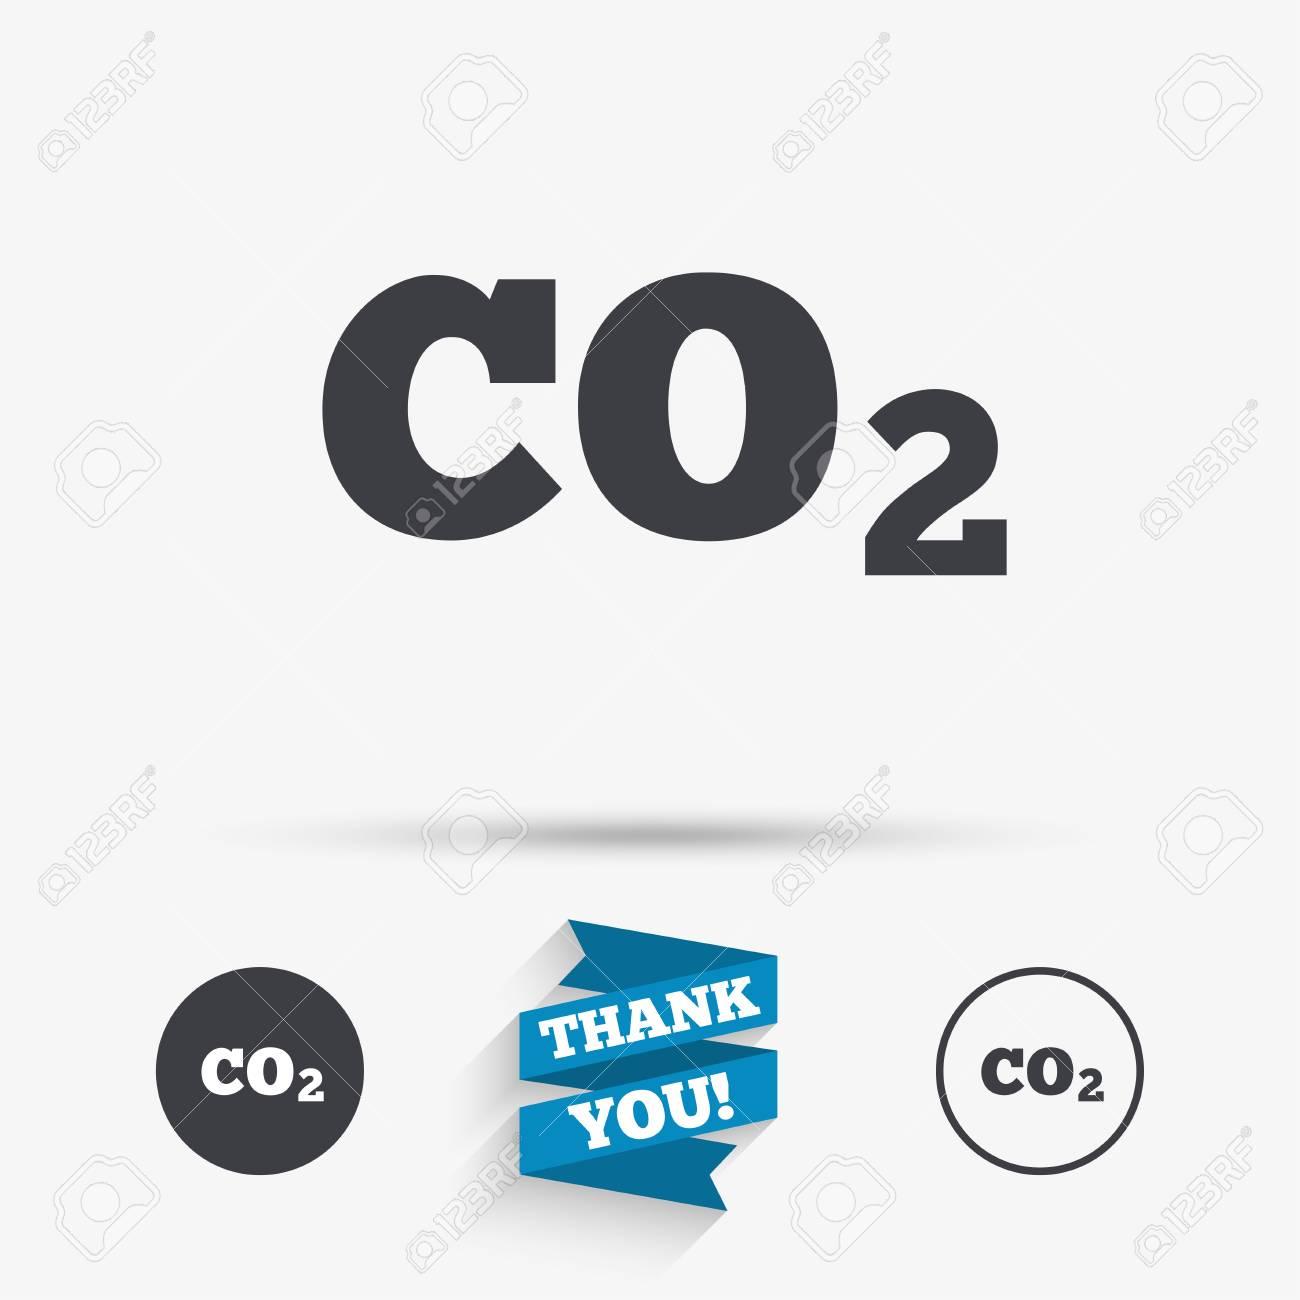 Co2 carbon dioxide formula sign icon chemistry symbol flat co2 carbon dioxide formula sign icon chemistry symbol flat icons buttons with icons buycottarizona Images